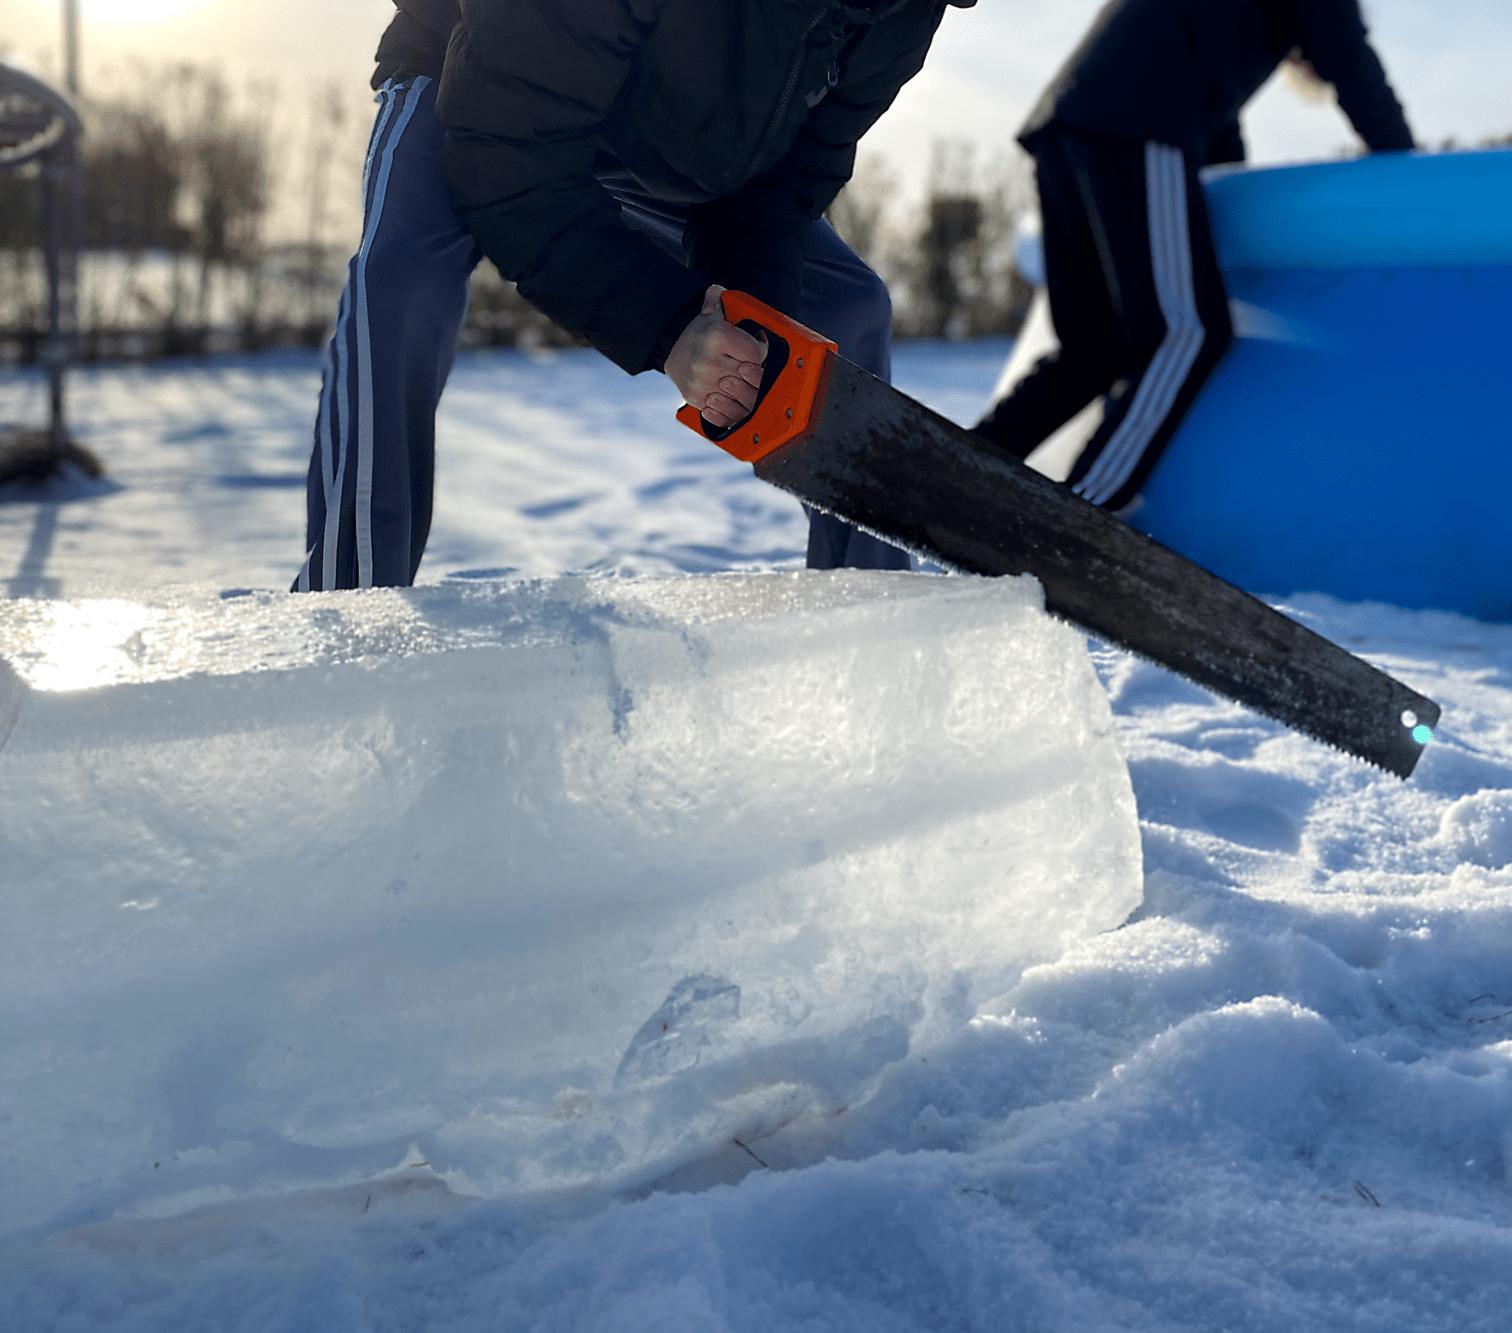 30-40 cm is Wim Hof Metoden isbad og angst